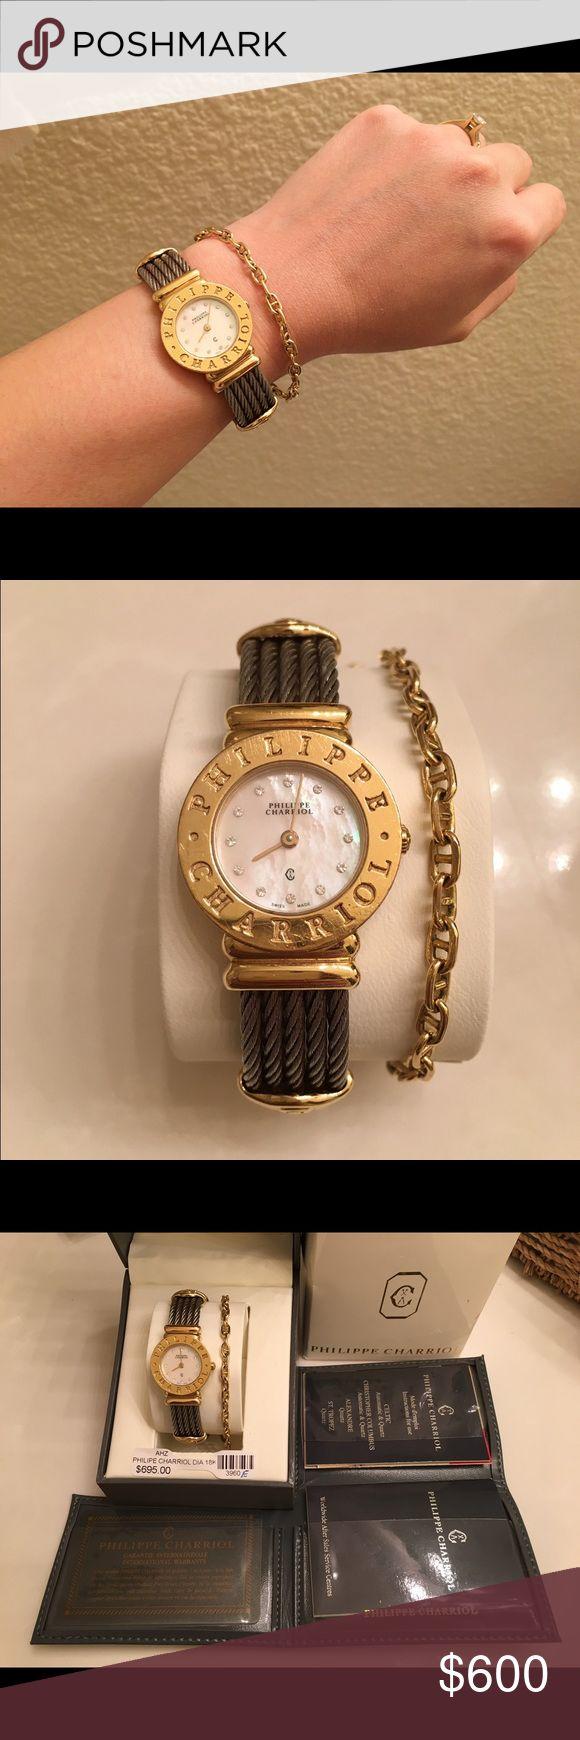 Charriol watch Philippe Charriol St Tropez charriol Accessories Watches